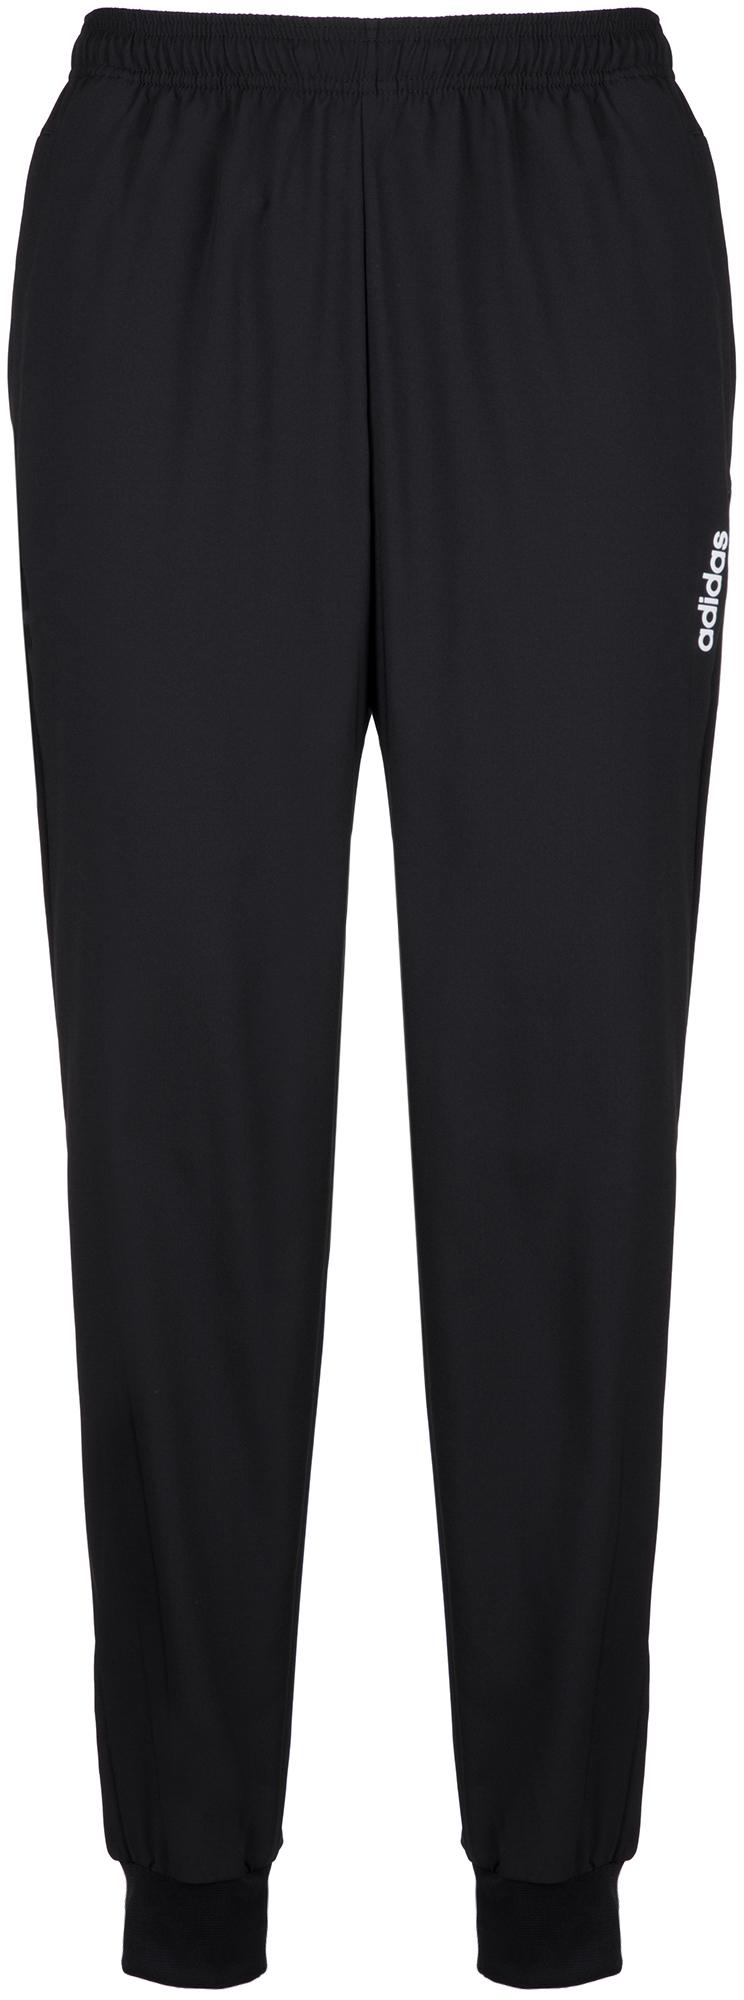 Adidas Брюки мужские Adidas Essentials Stanford, размер 52-54 шорты для тенниса мужские adidas uncontrol climachill цвет черный b45842 размер l 52 54